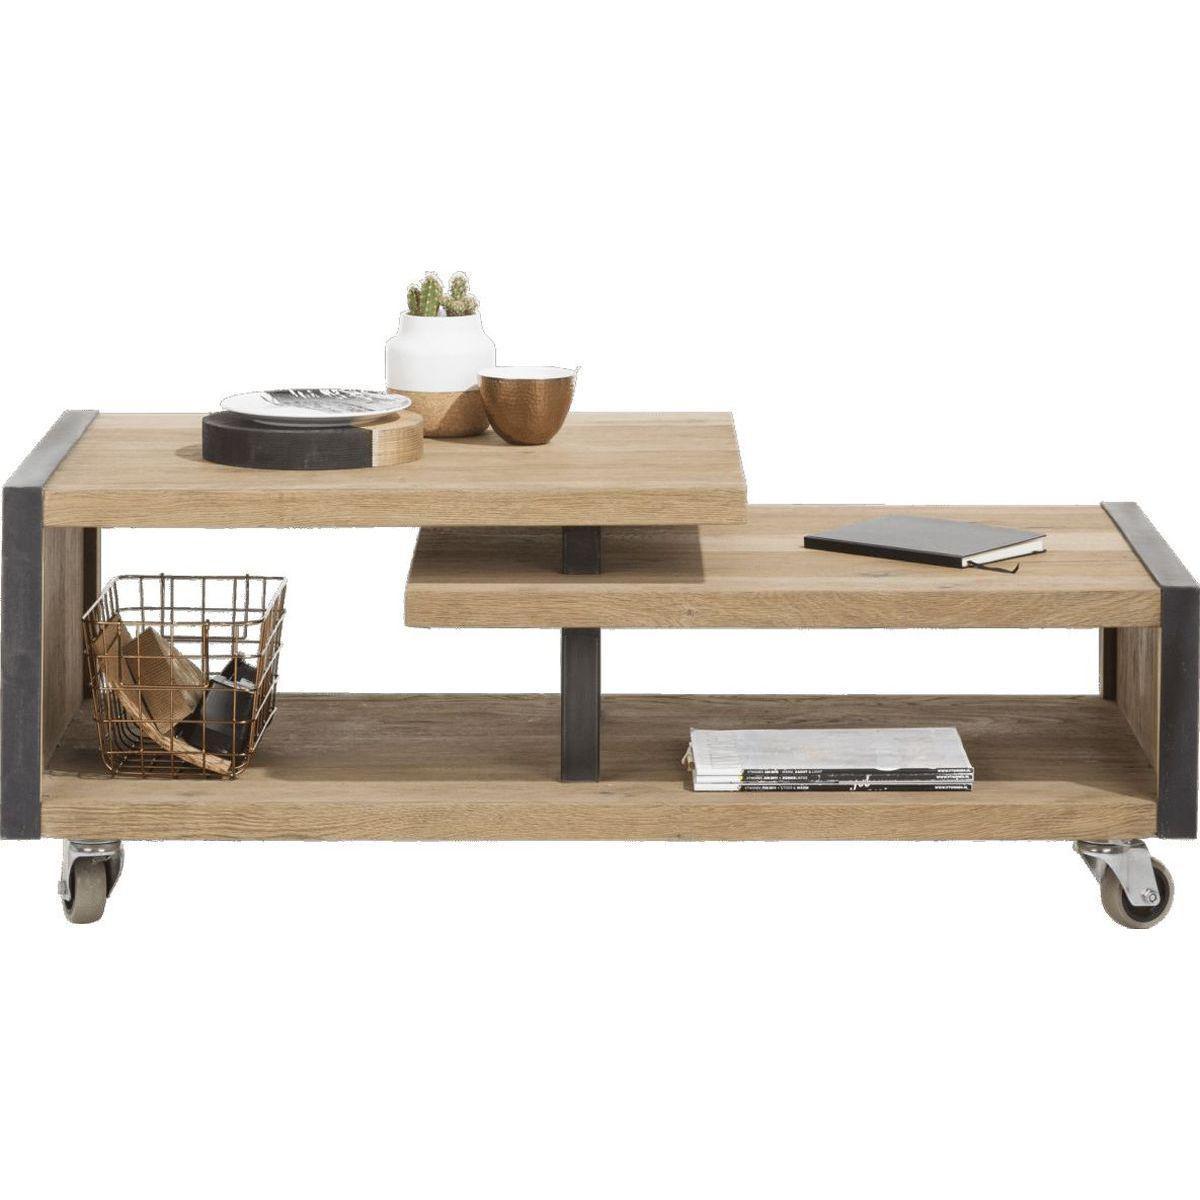 Table basse METALO HetH 120x60cm